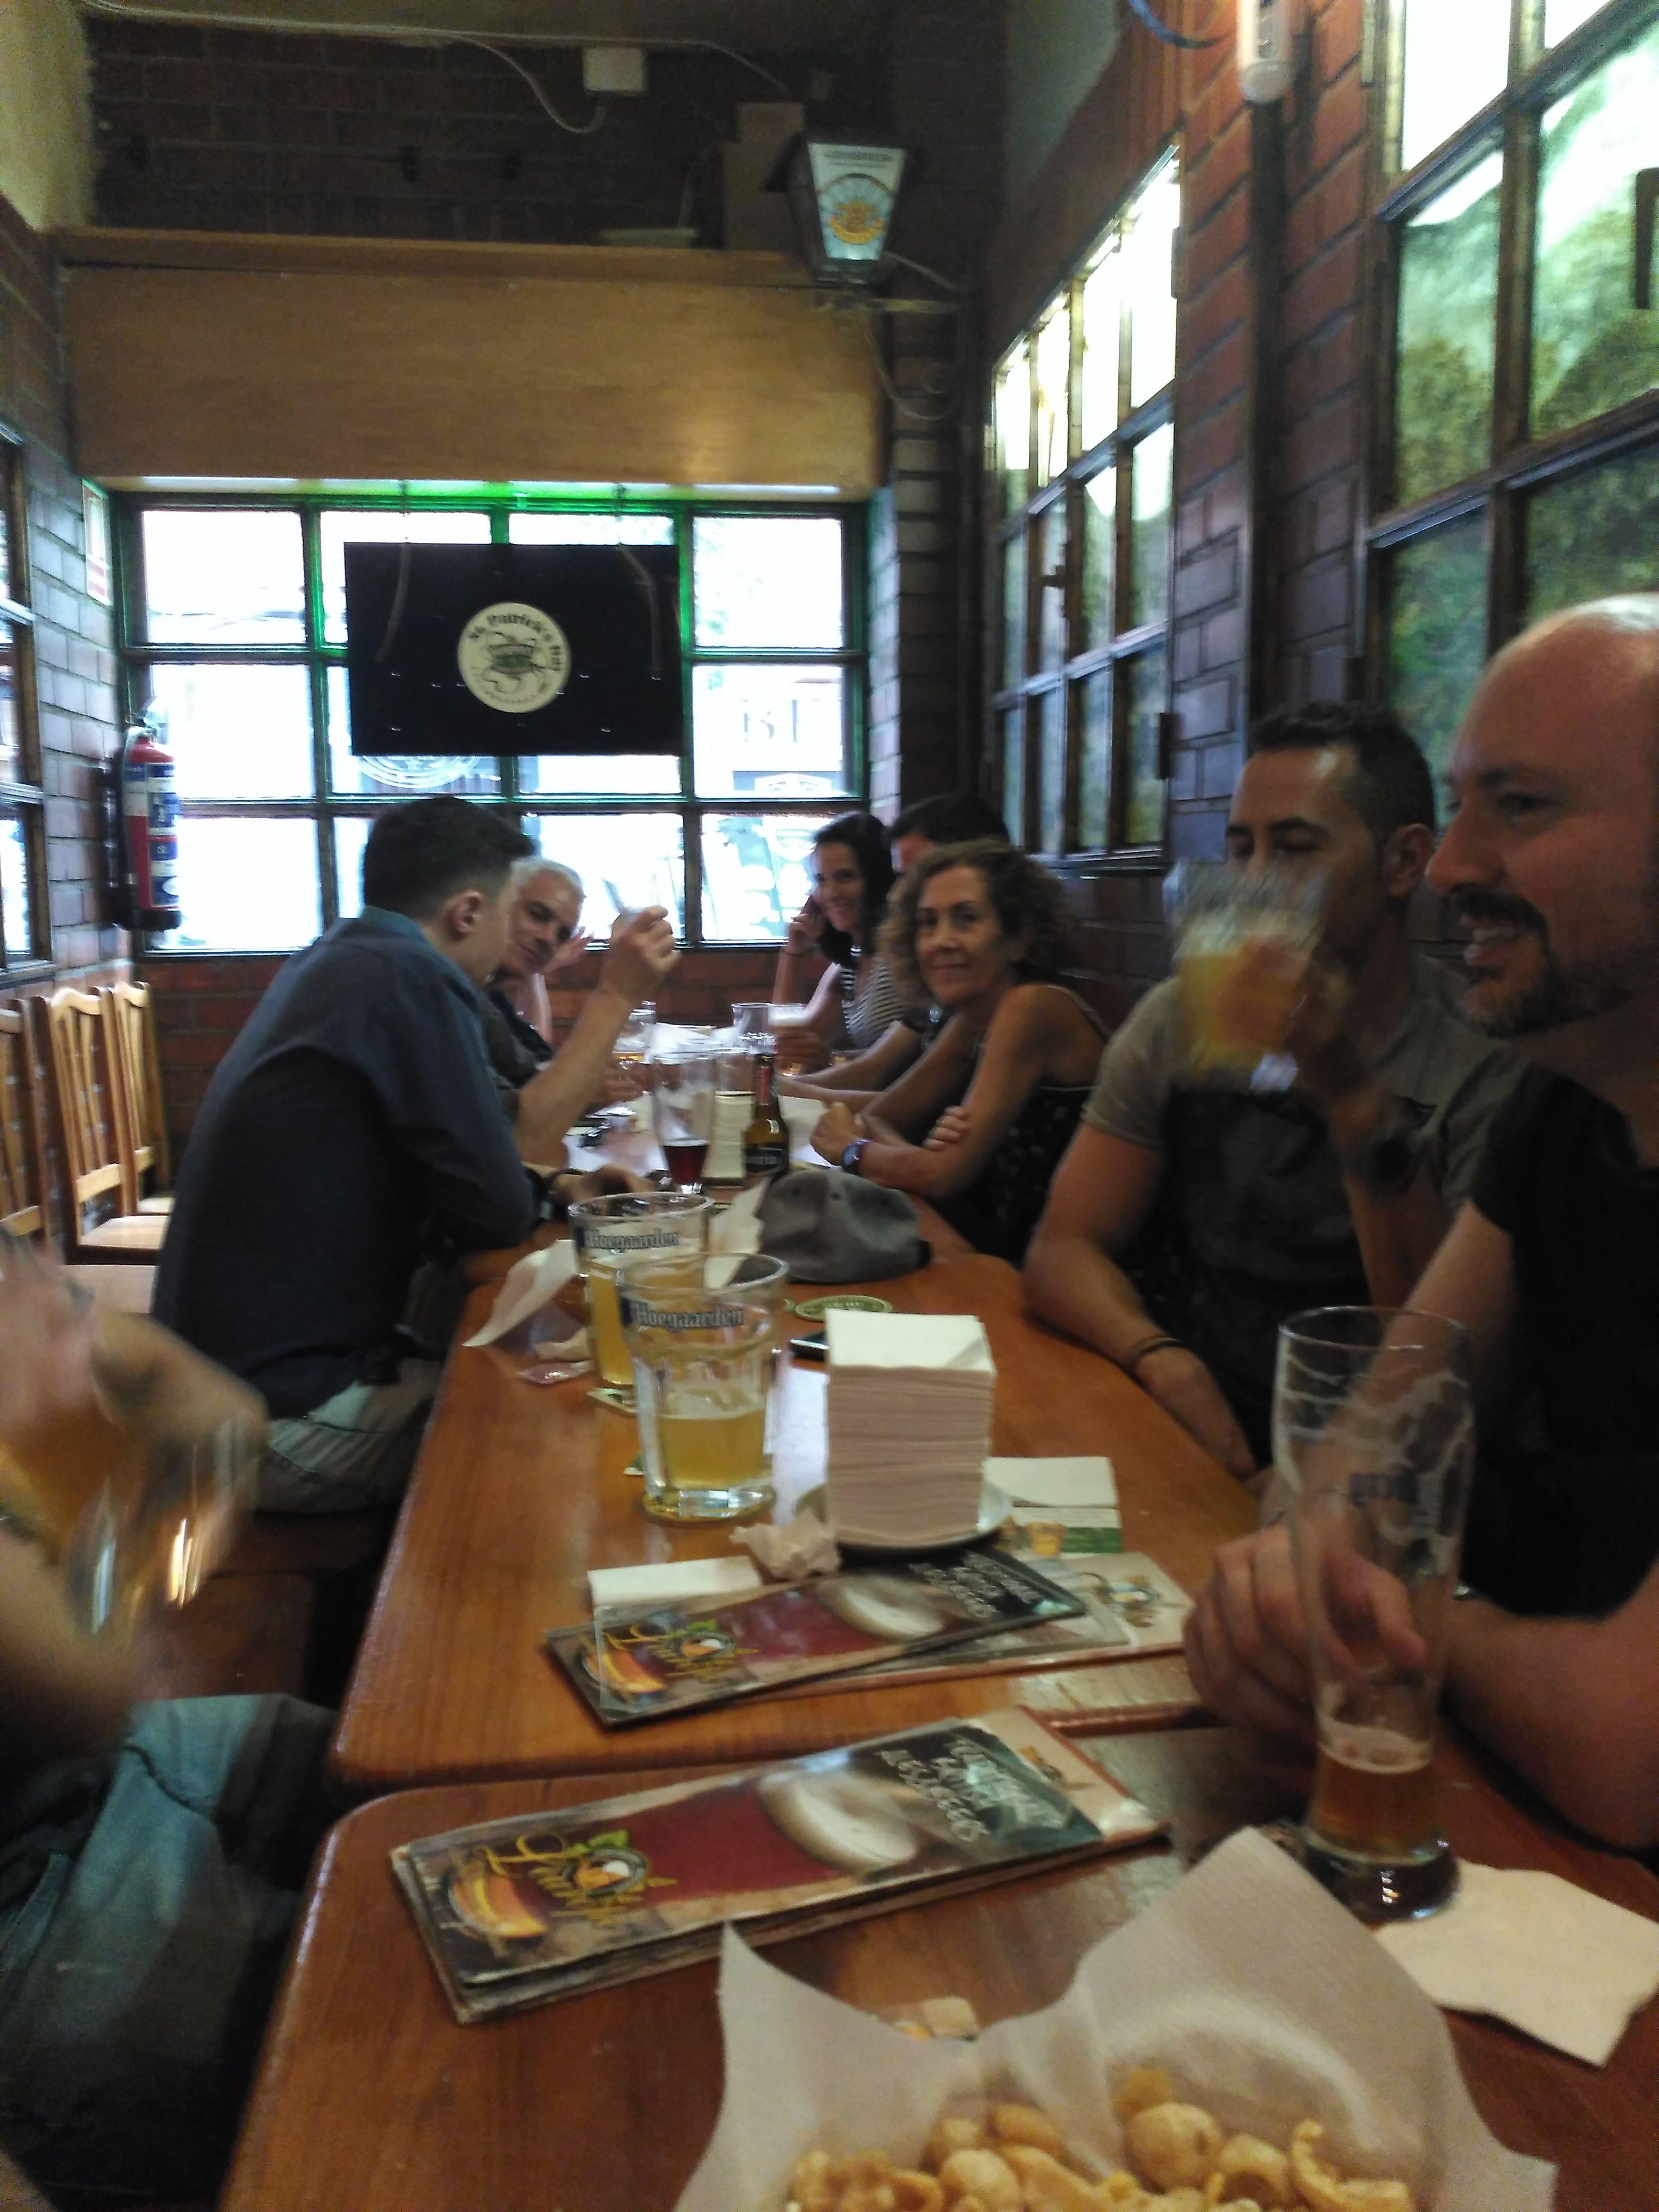 Cervezas e Inglés -- Beer and English